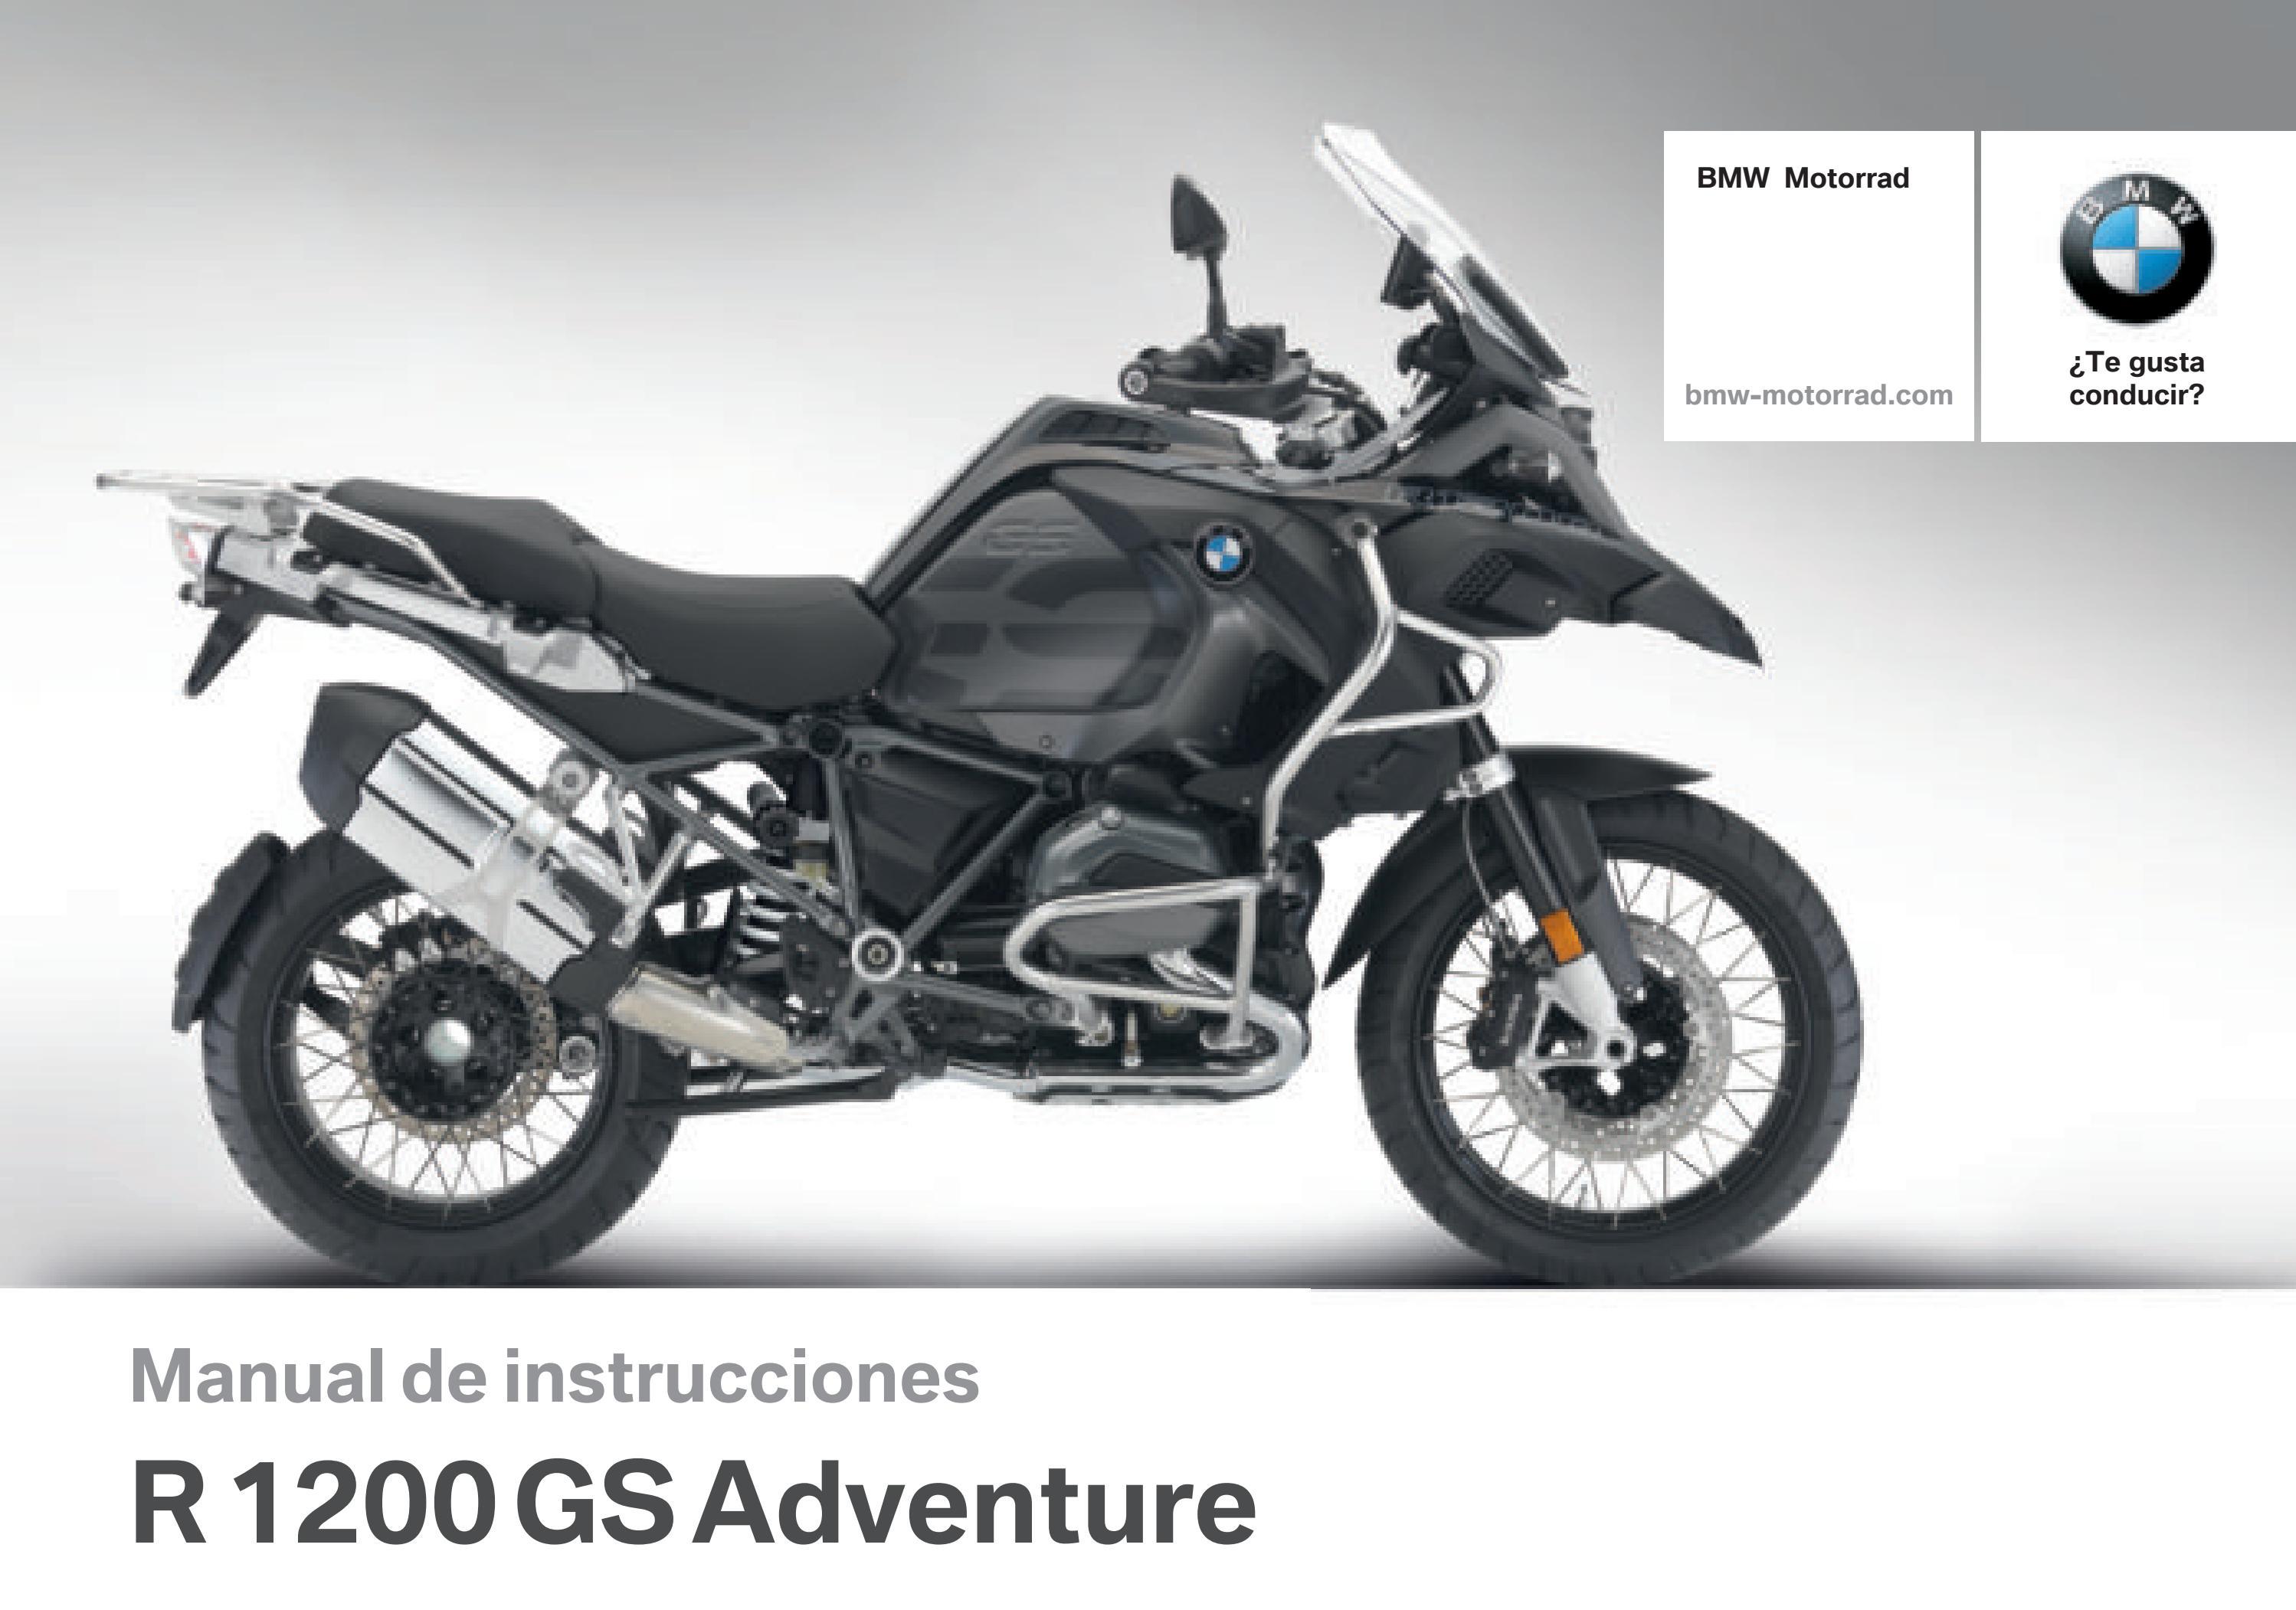 74e304d05ba1 2016 2017 bmw r 1200 gs adventure 71572 by Ramon Sanz - issuu